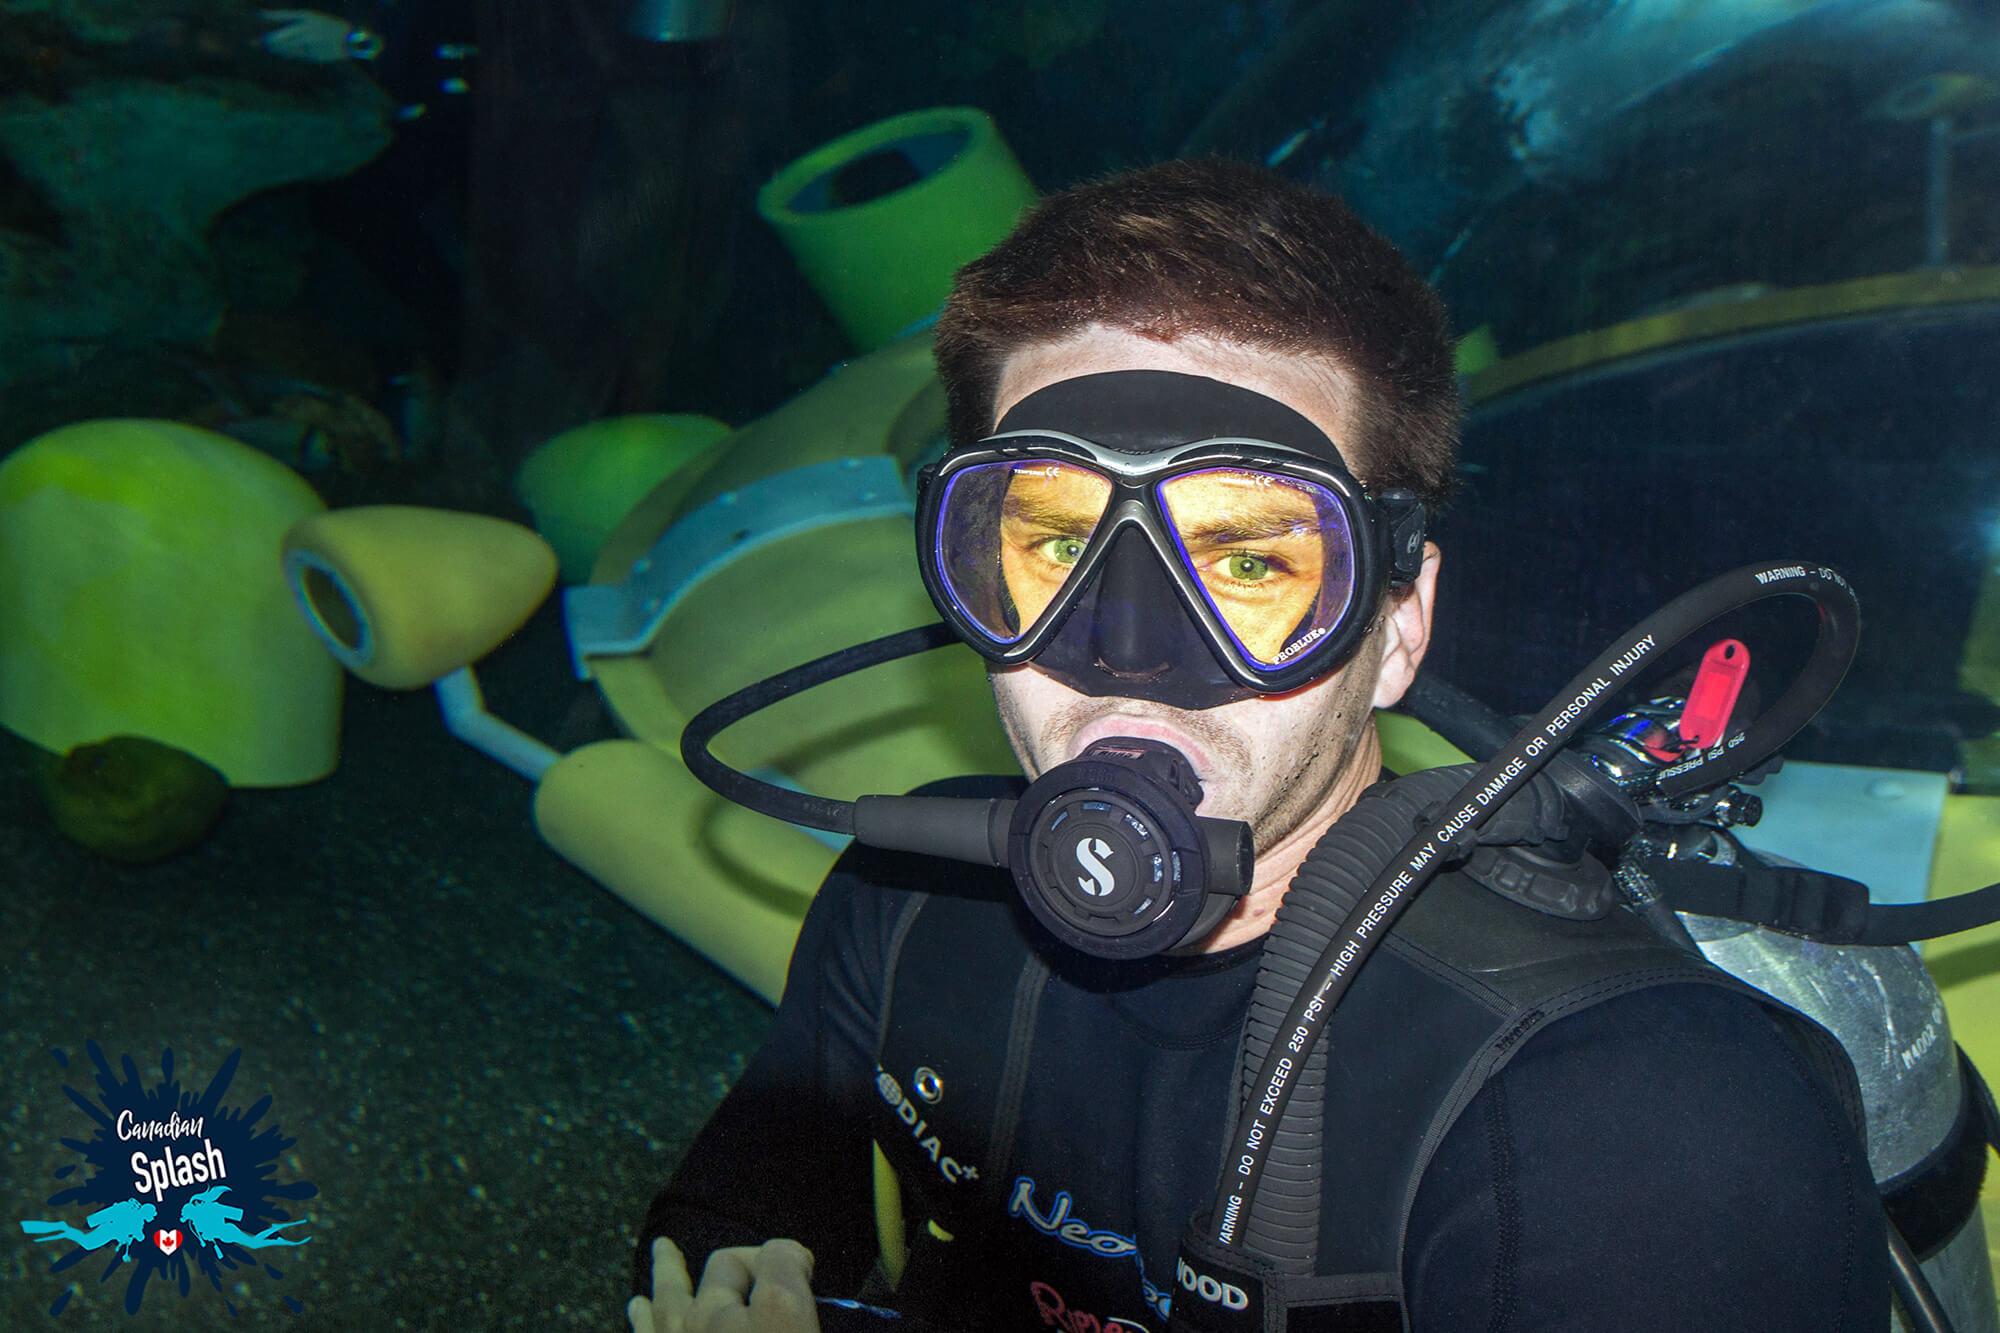 Joey Scuba Diving Near The Ripley's Submarine In The Aquarium, Scuba Diving Ripley's Aquarium, Ontario, Canada